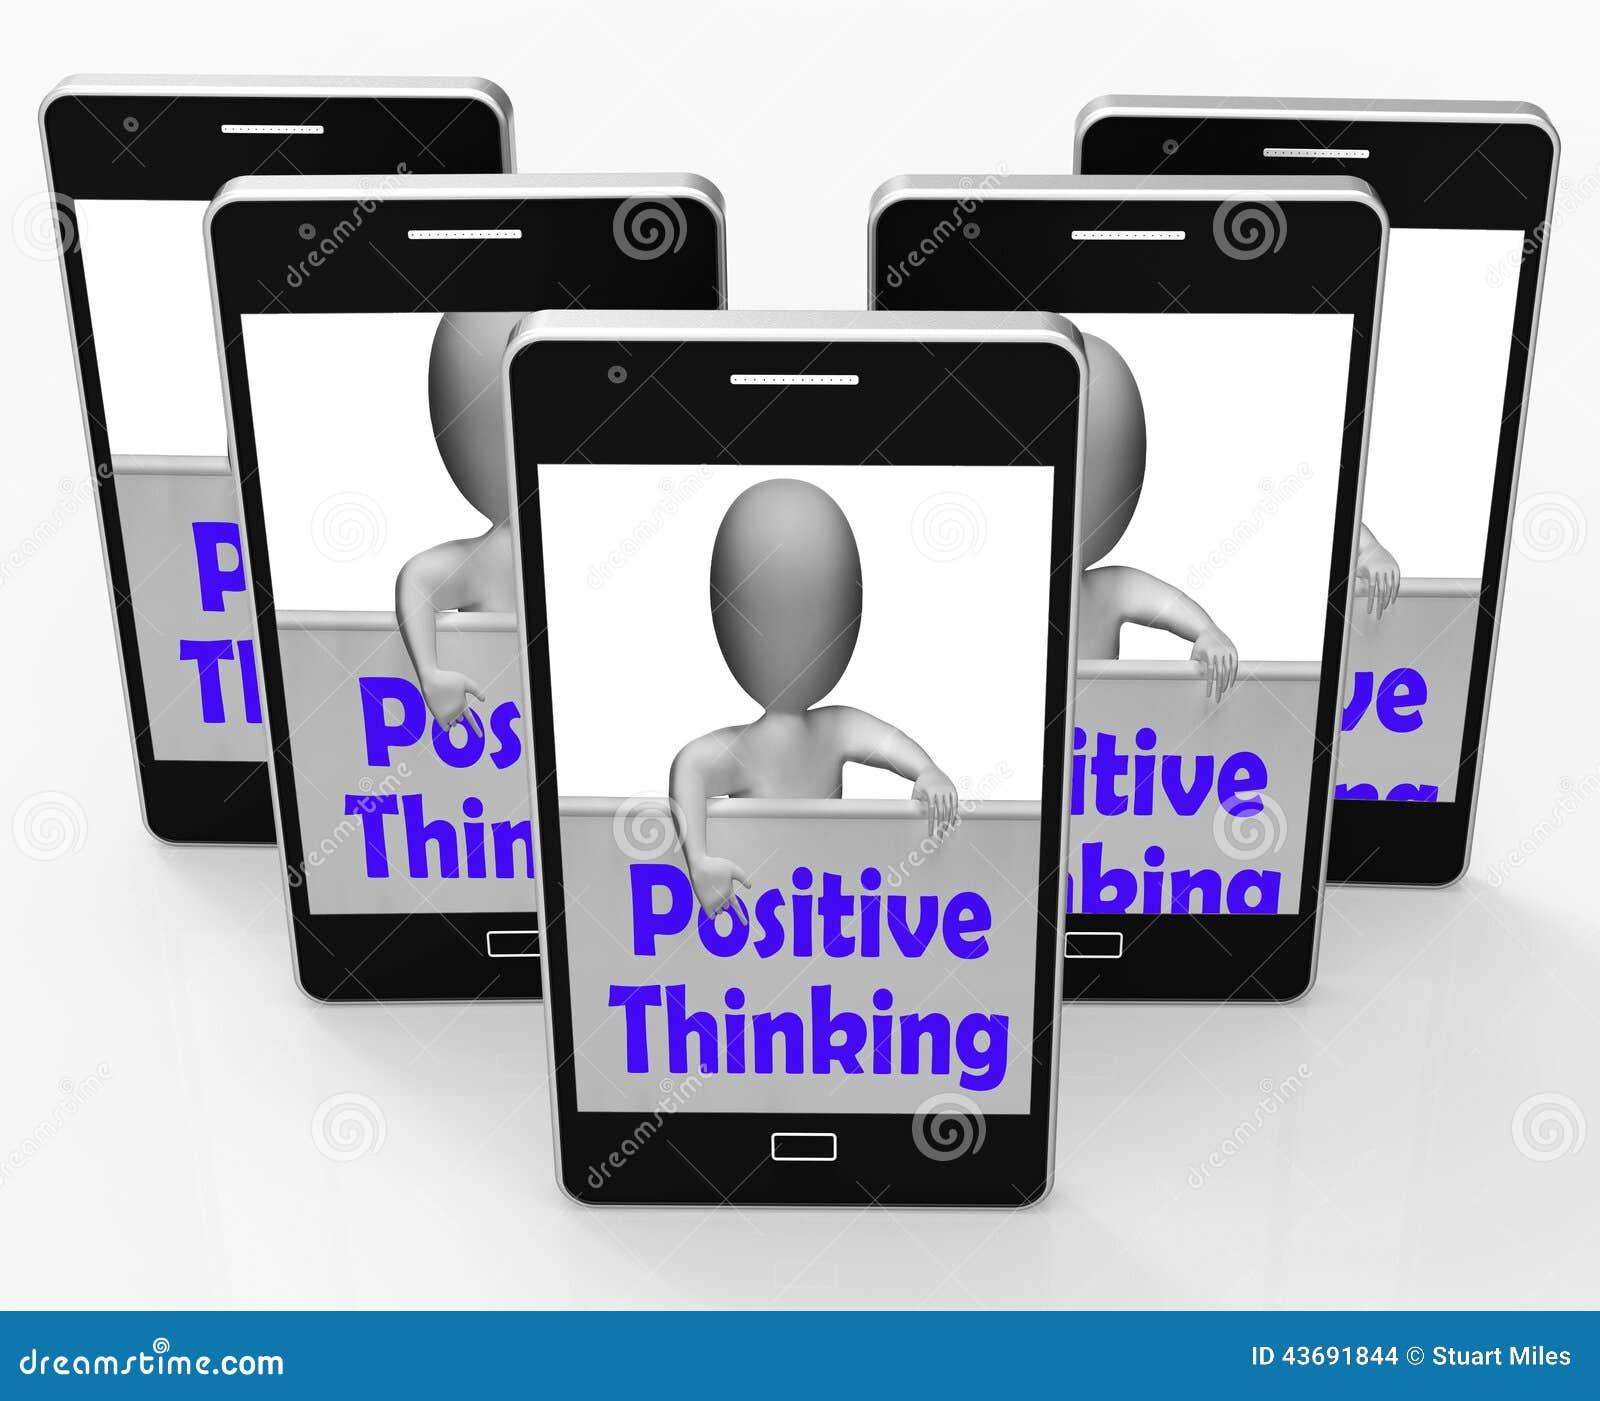 Optimistic thinking quotes day